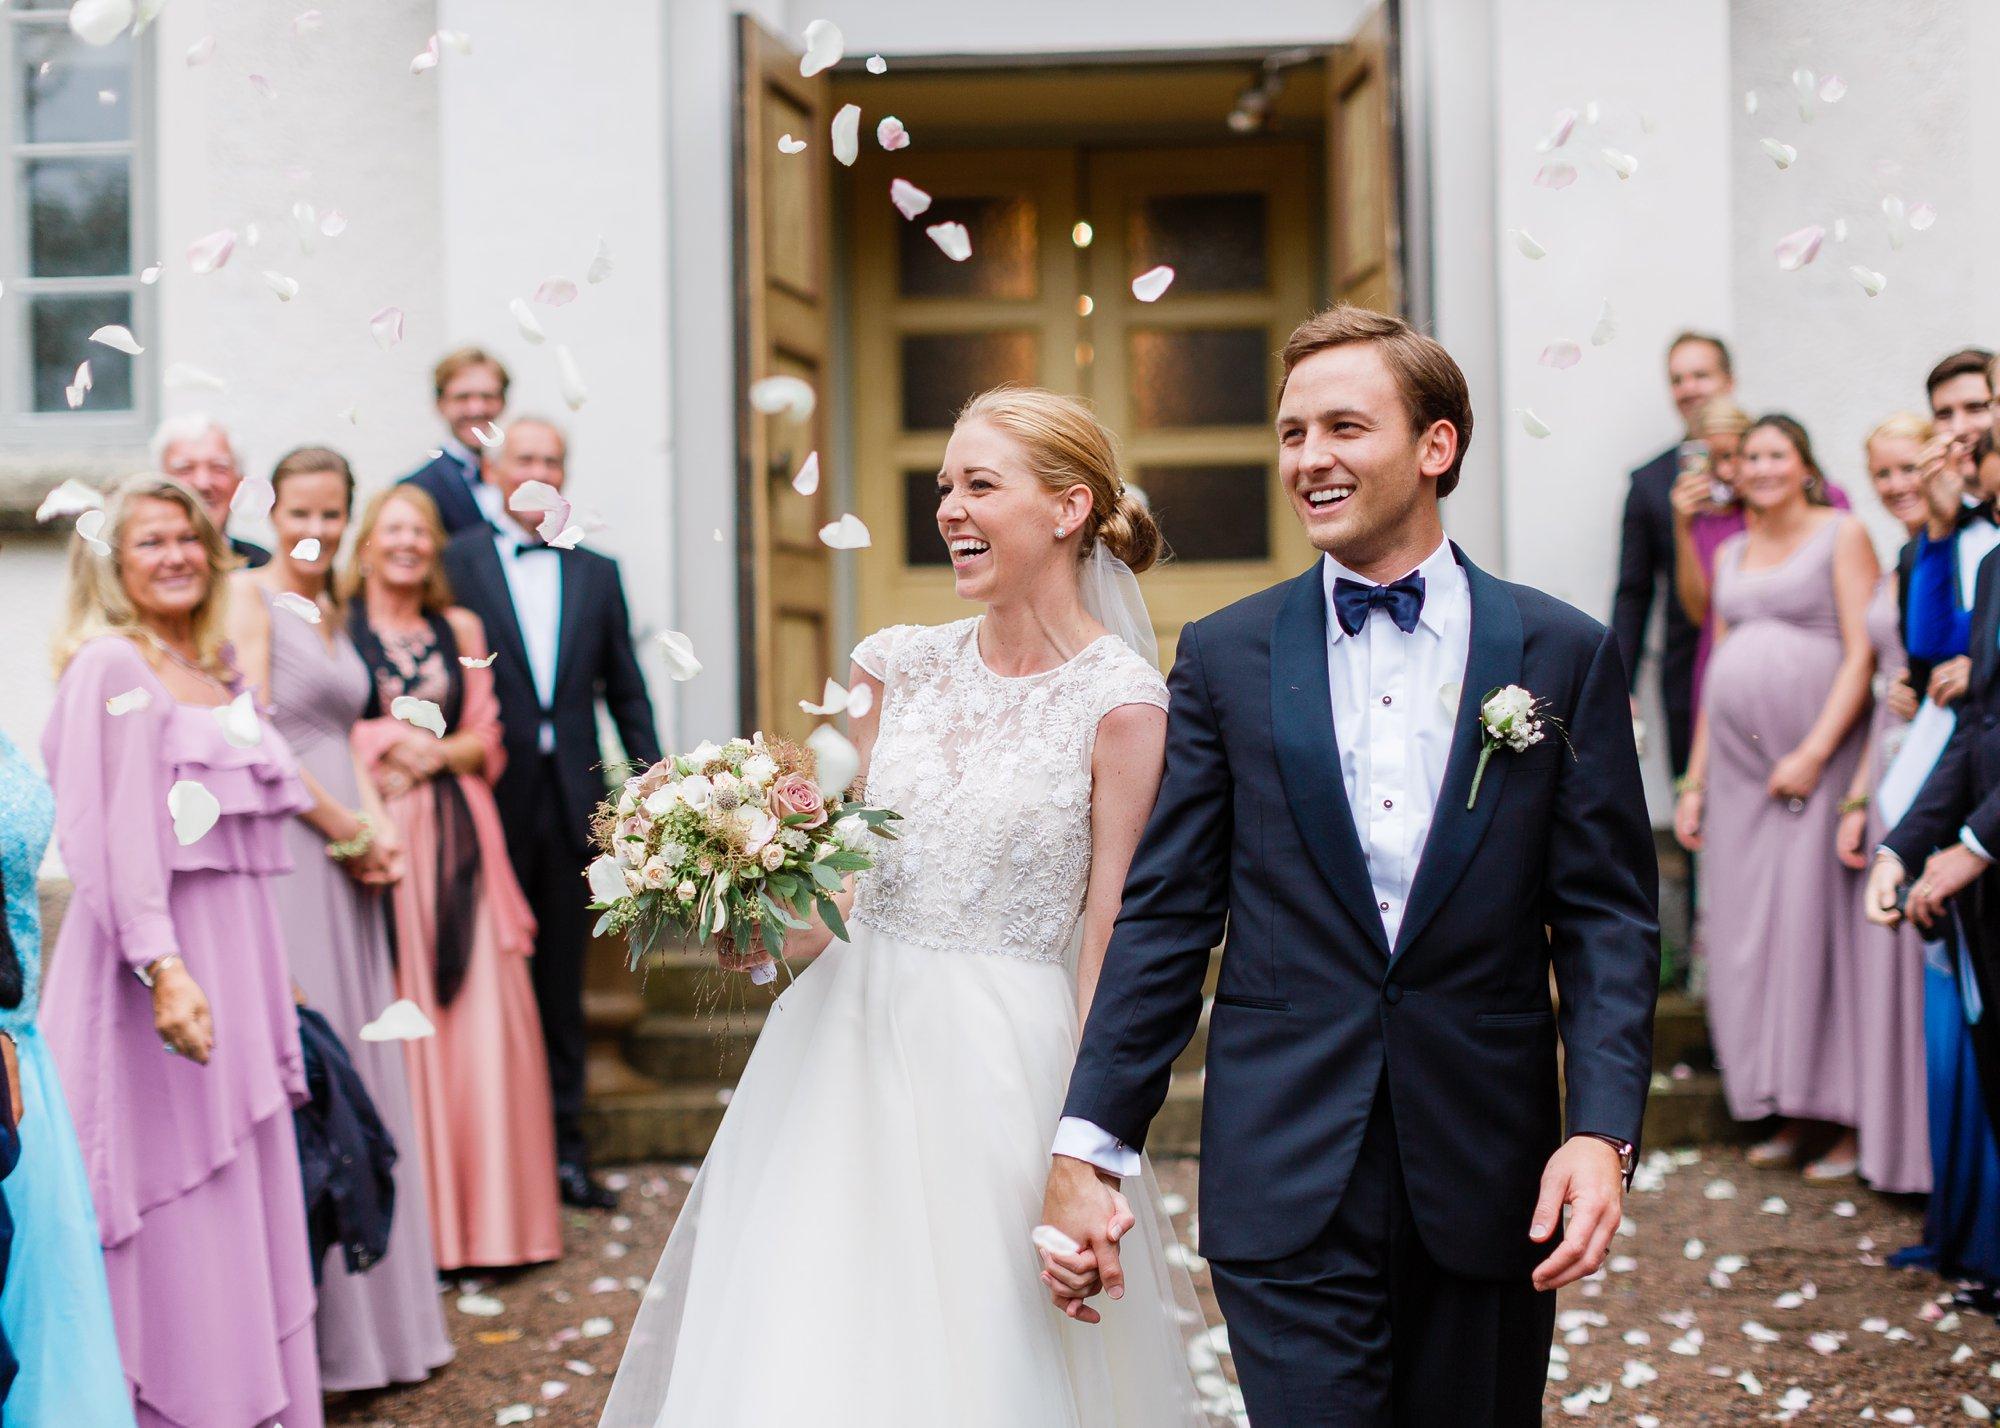 Newlyweds outside church wedding in Sweden